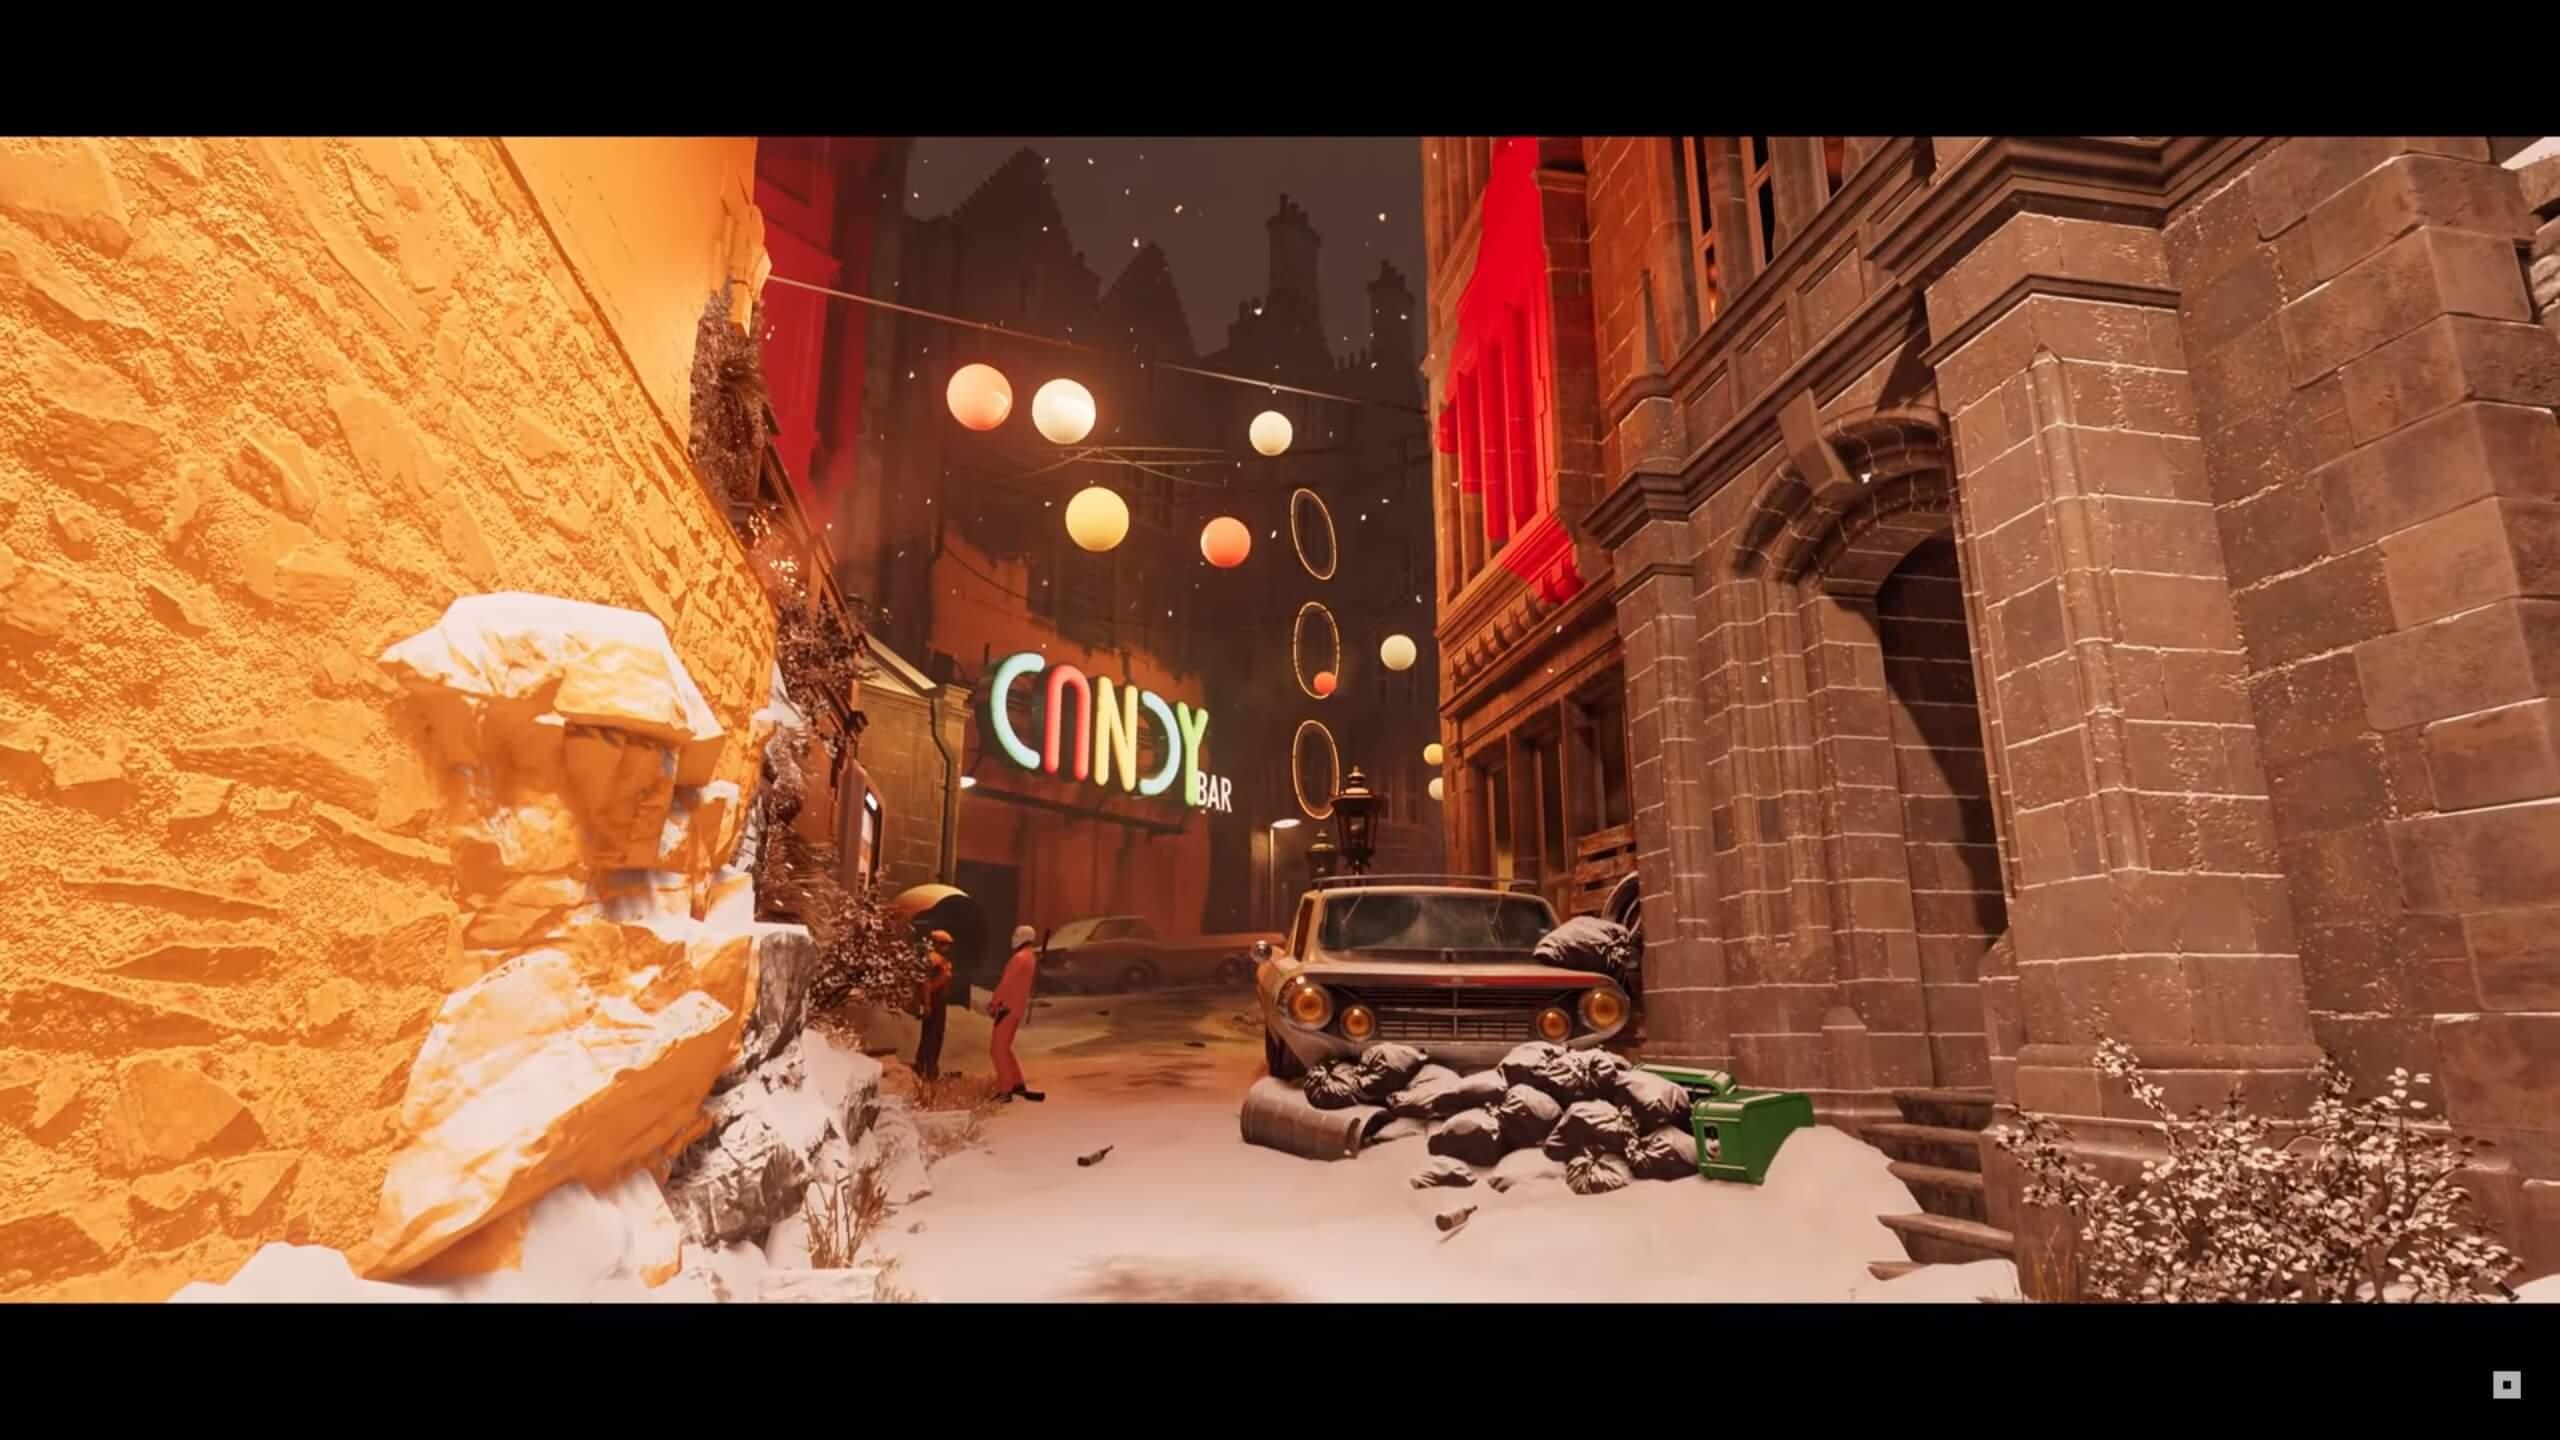 New gameplay trailer released for DEATHLOOP